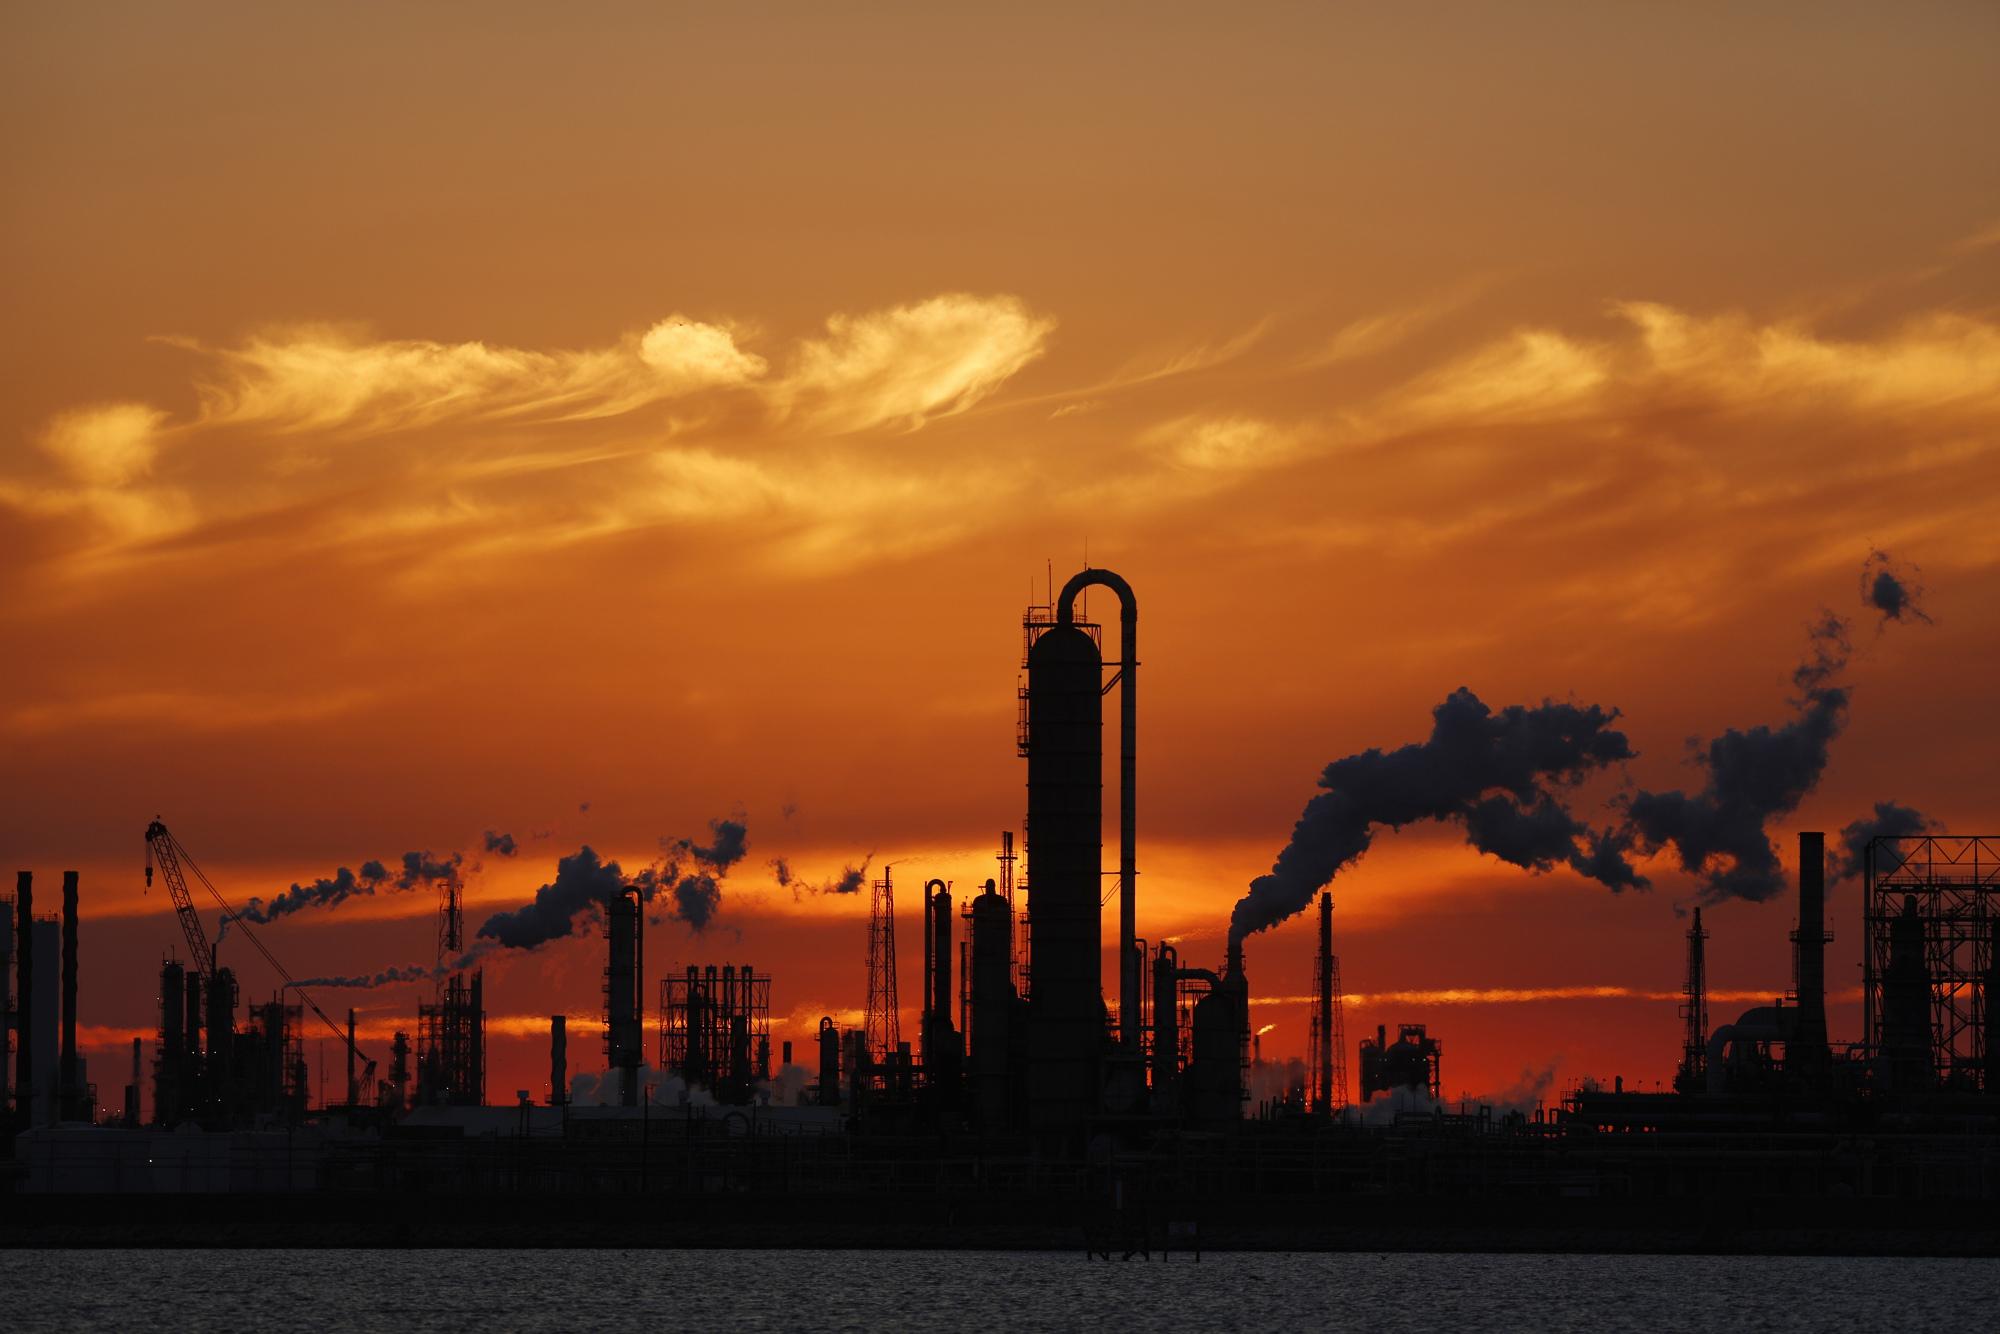 bloomberg.com - Bob Van Voris - New York's Global Warming Suit Against Oil Companies Tossed